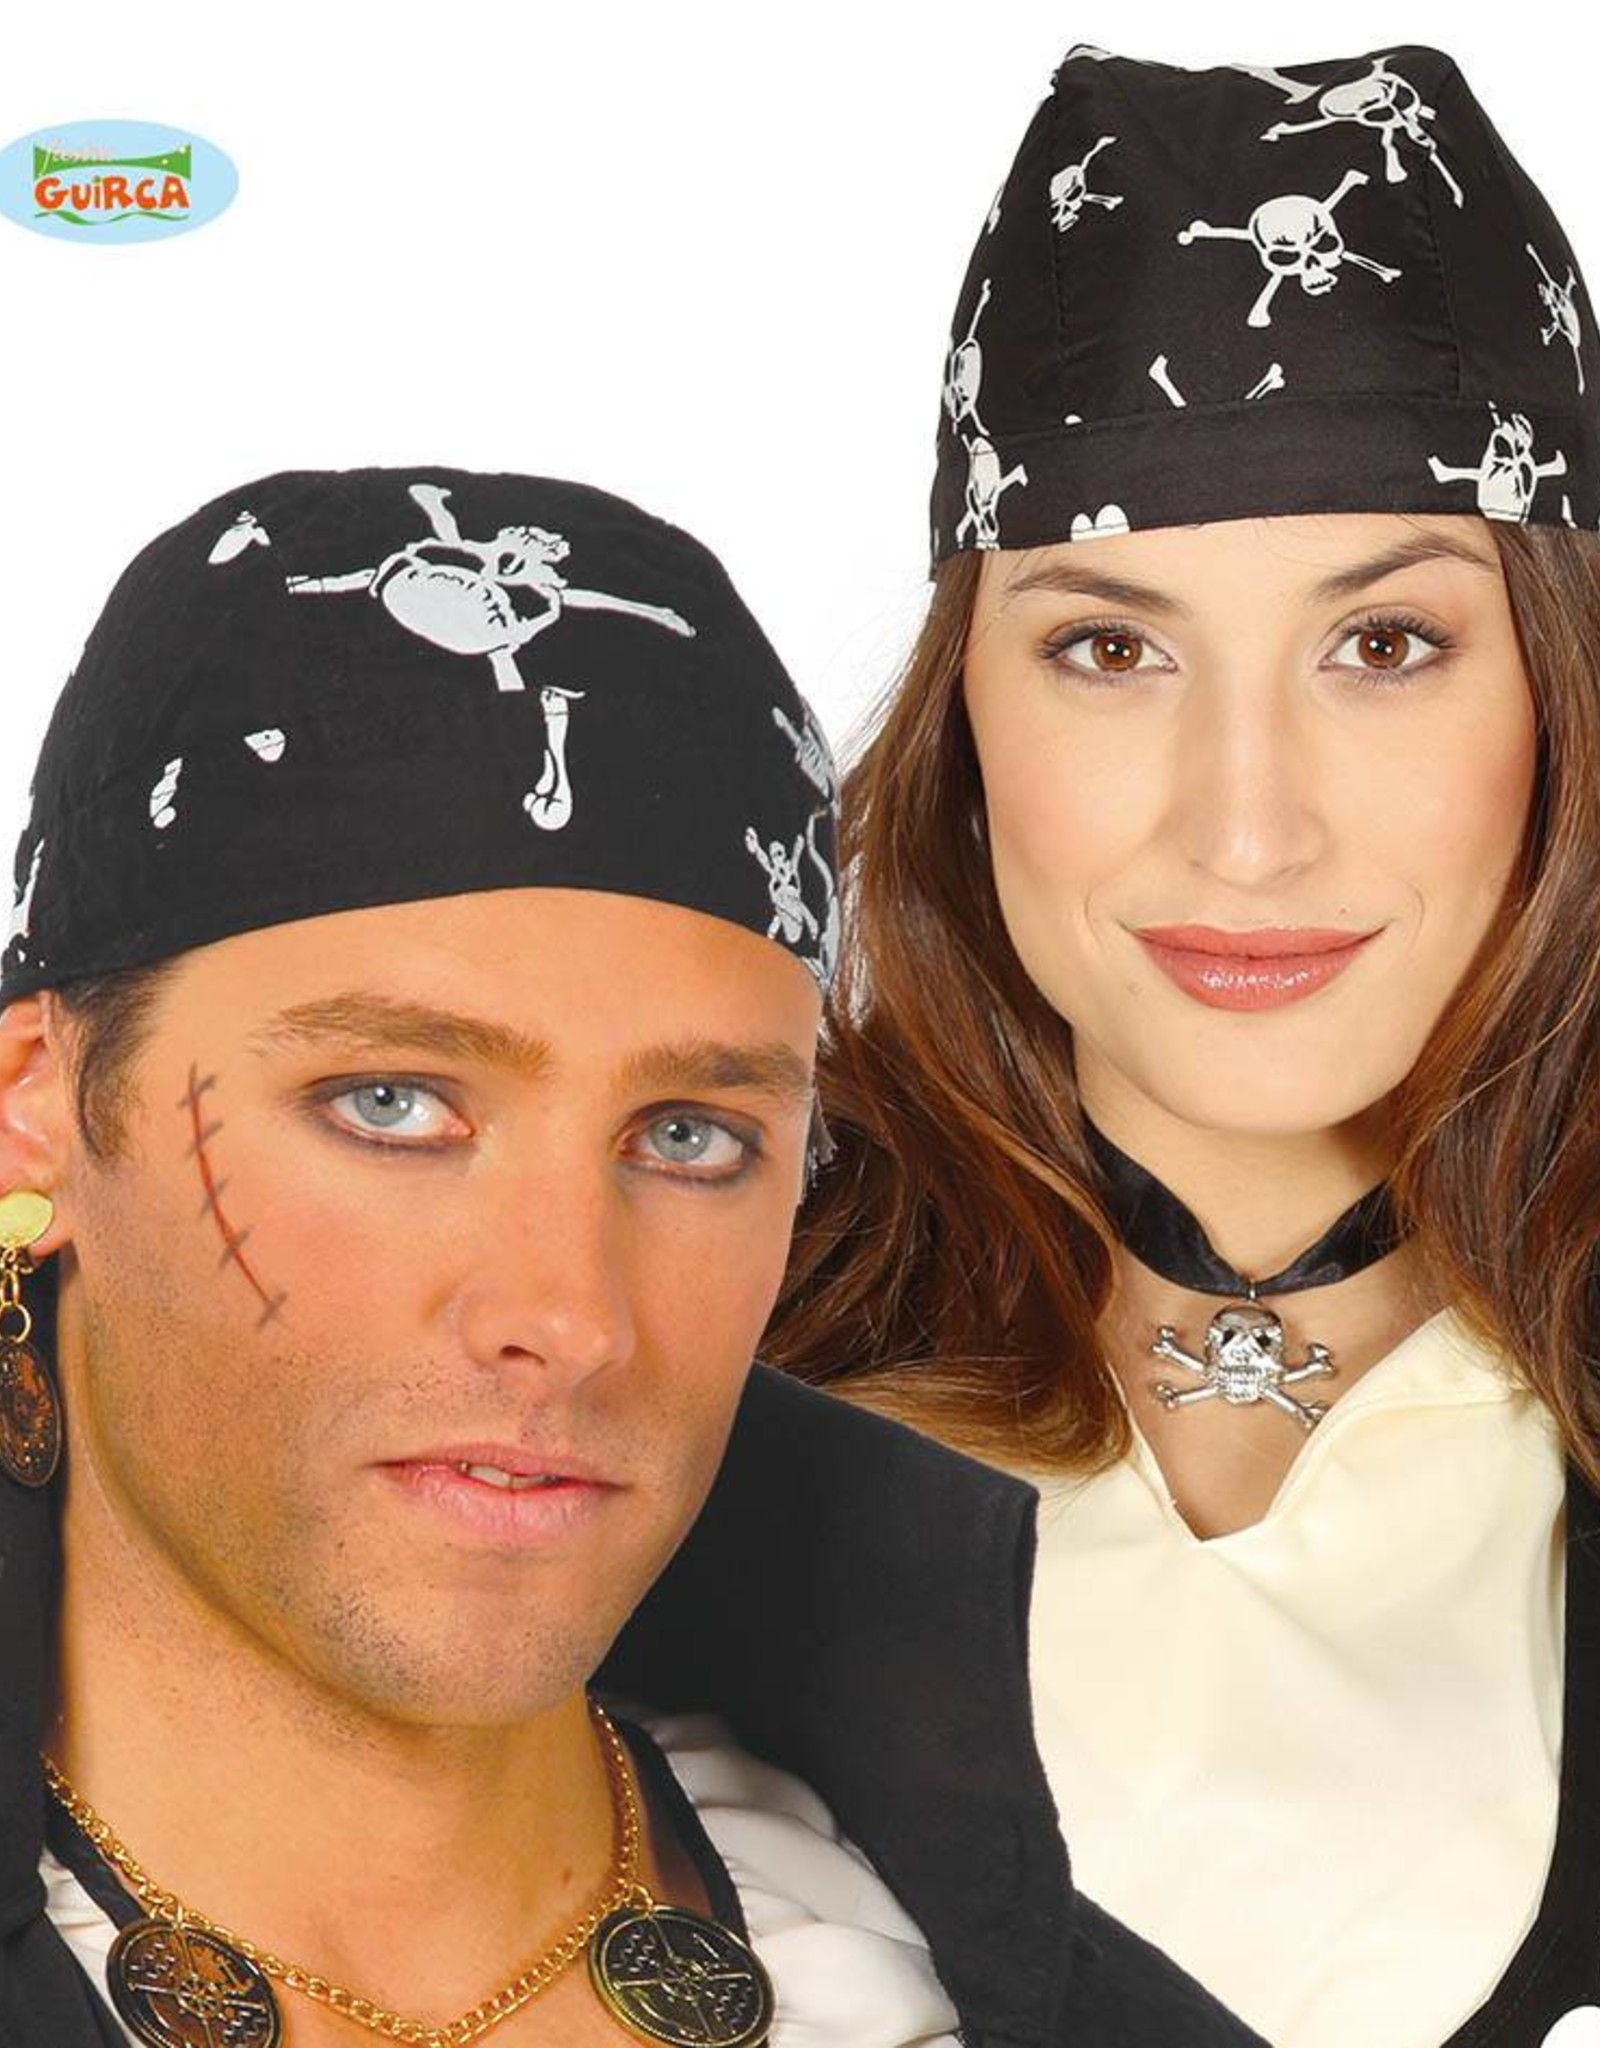 FIESTAS GUIRCA Bandana piraat